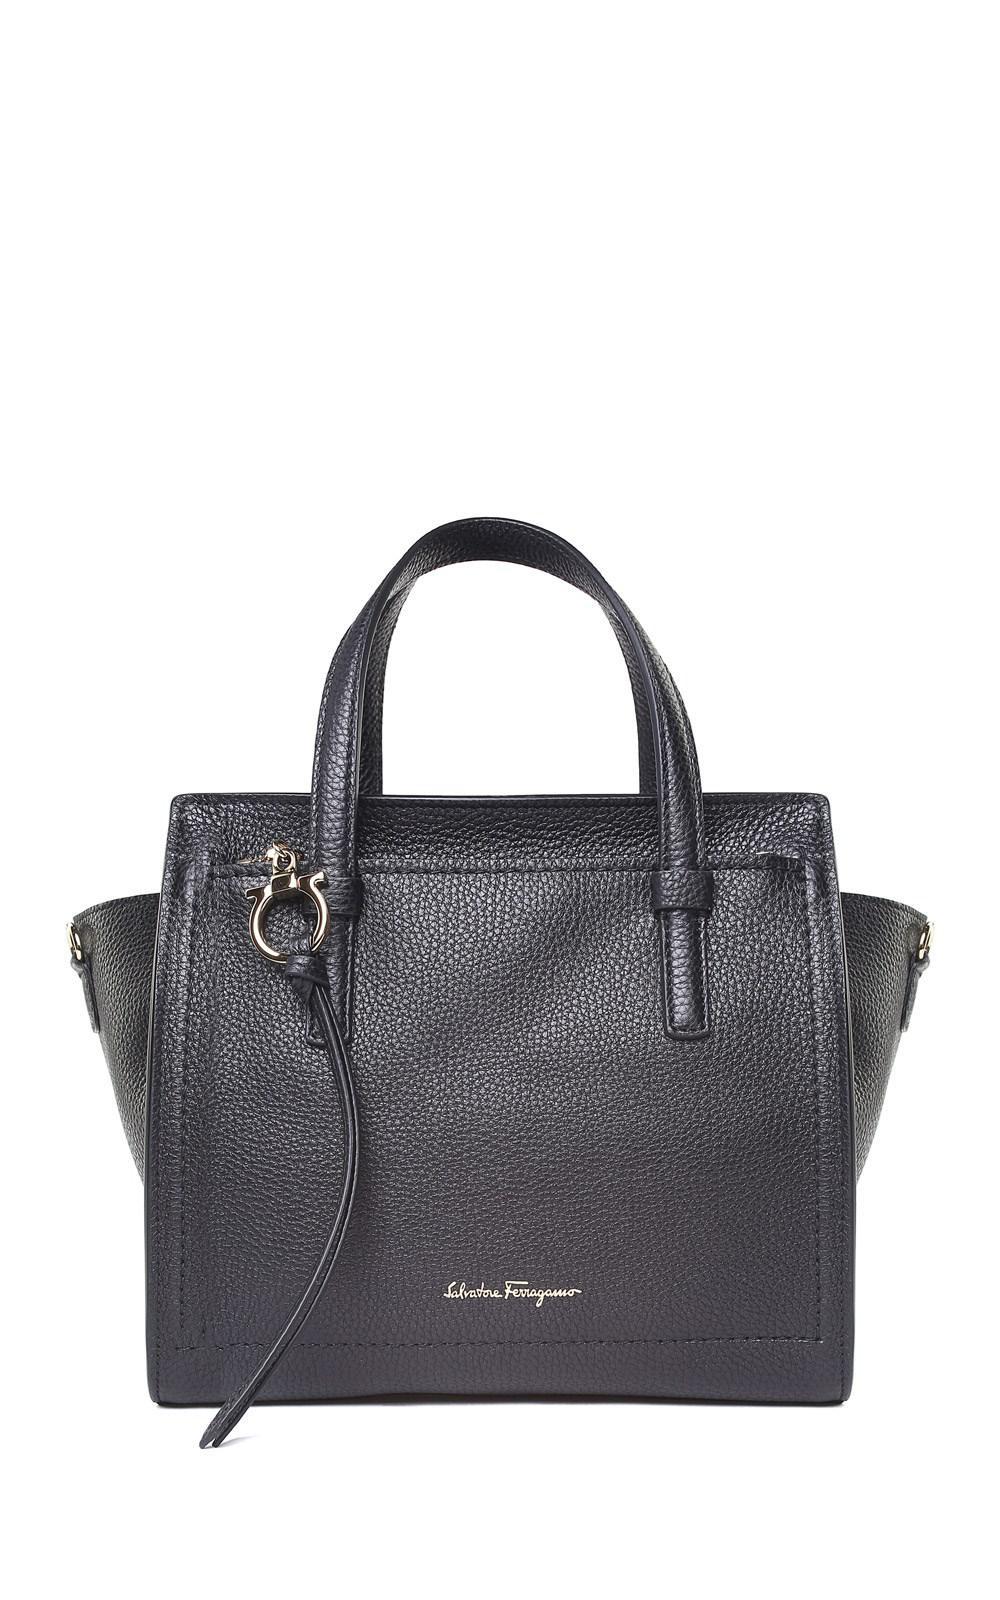 b564b0292bb8 Ferragamo - Black Amy Small Pebbled-leather Crossbody Bag - Lyst. View  fullscreen